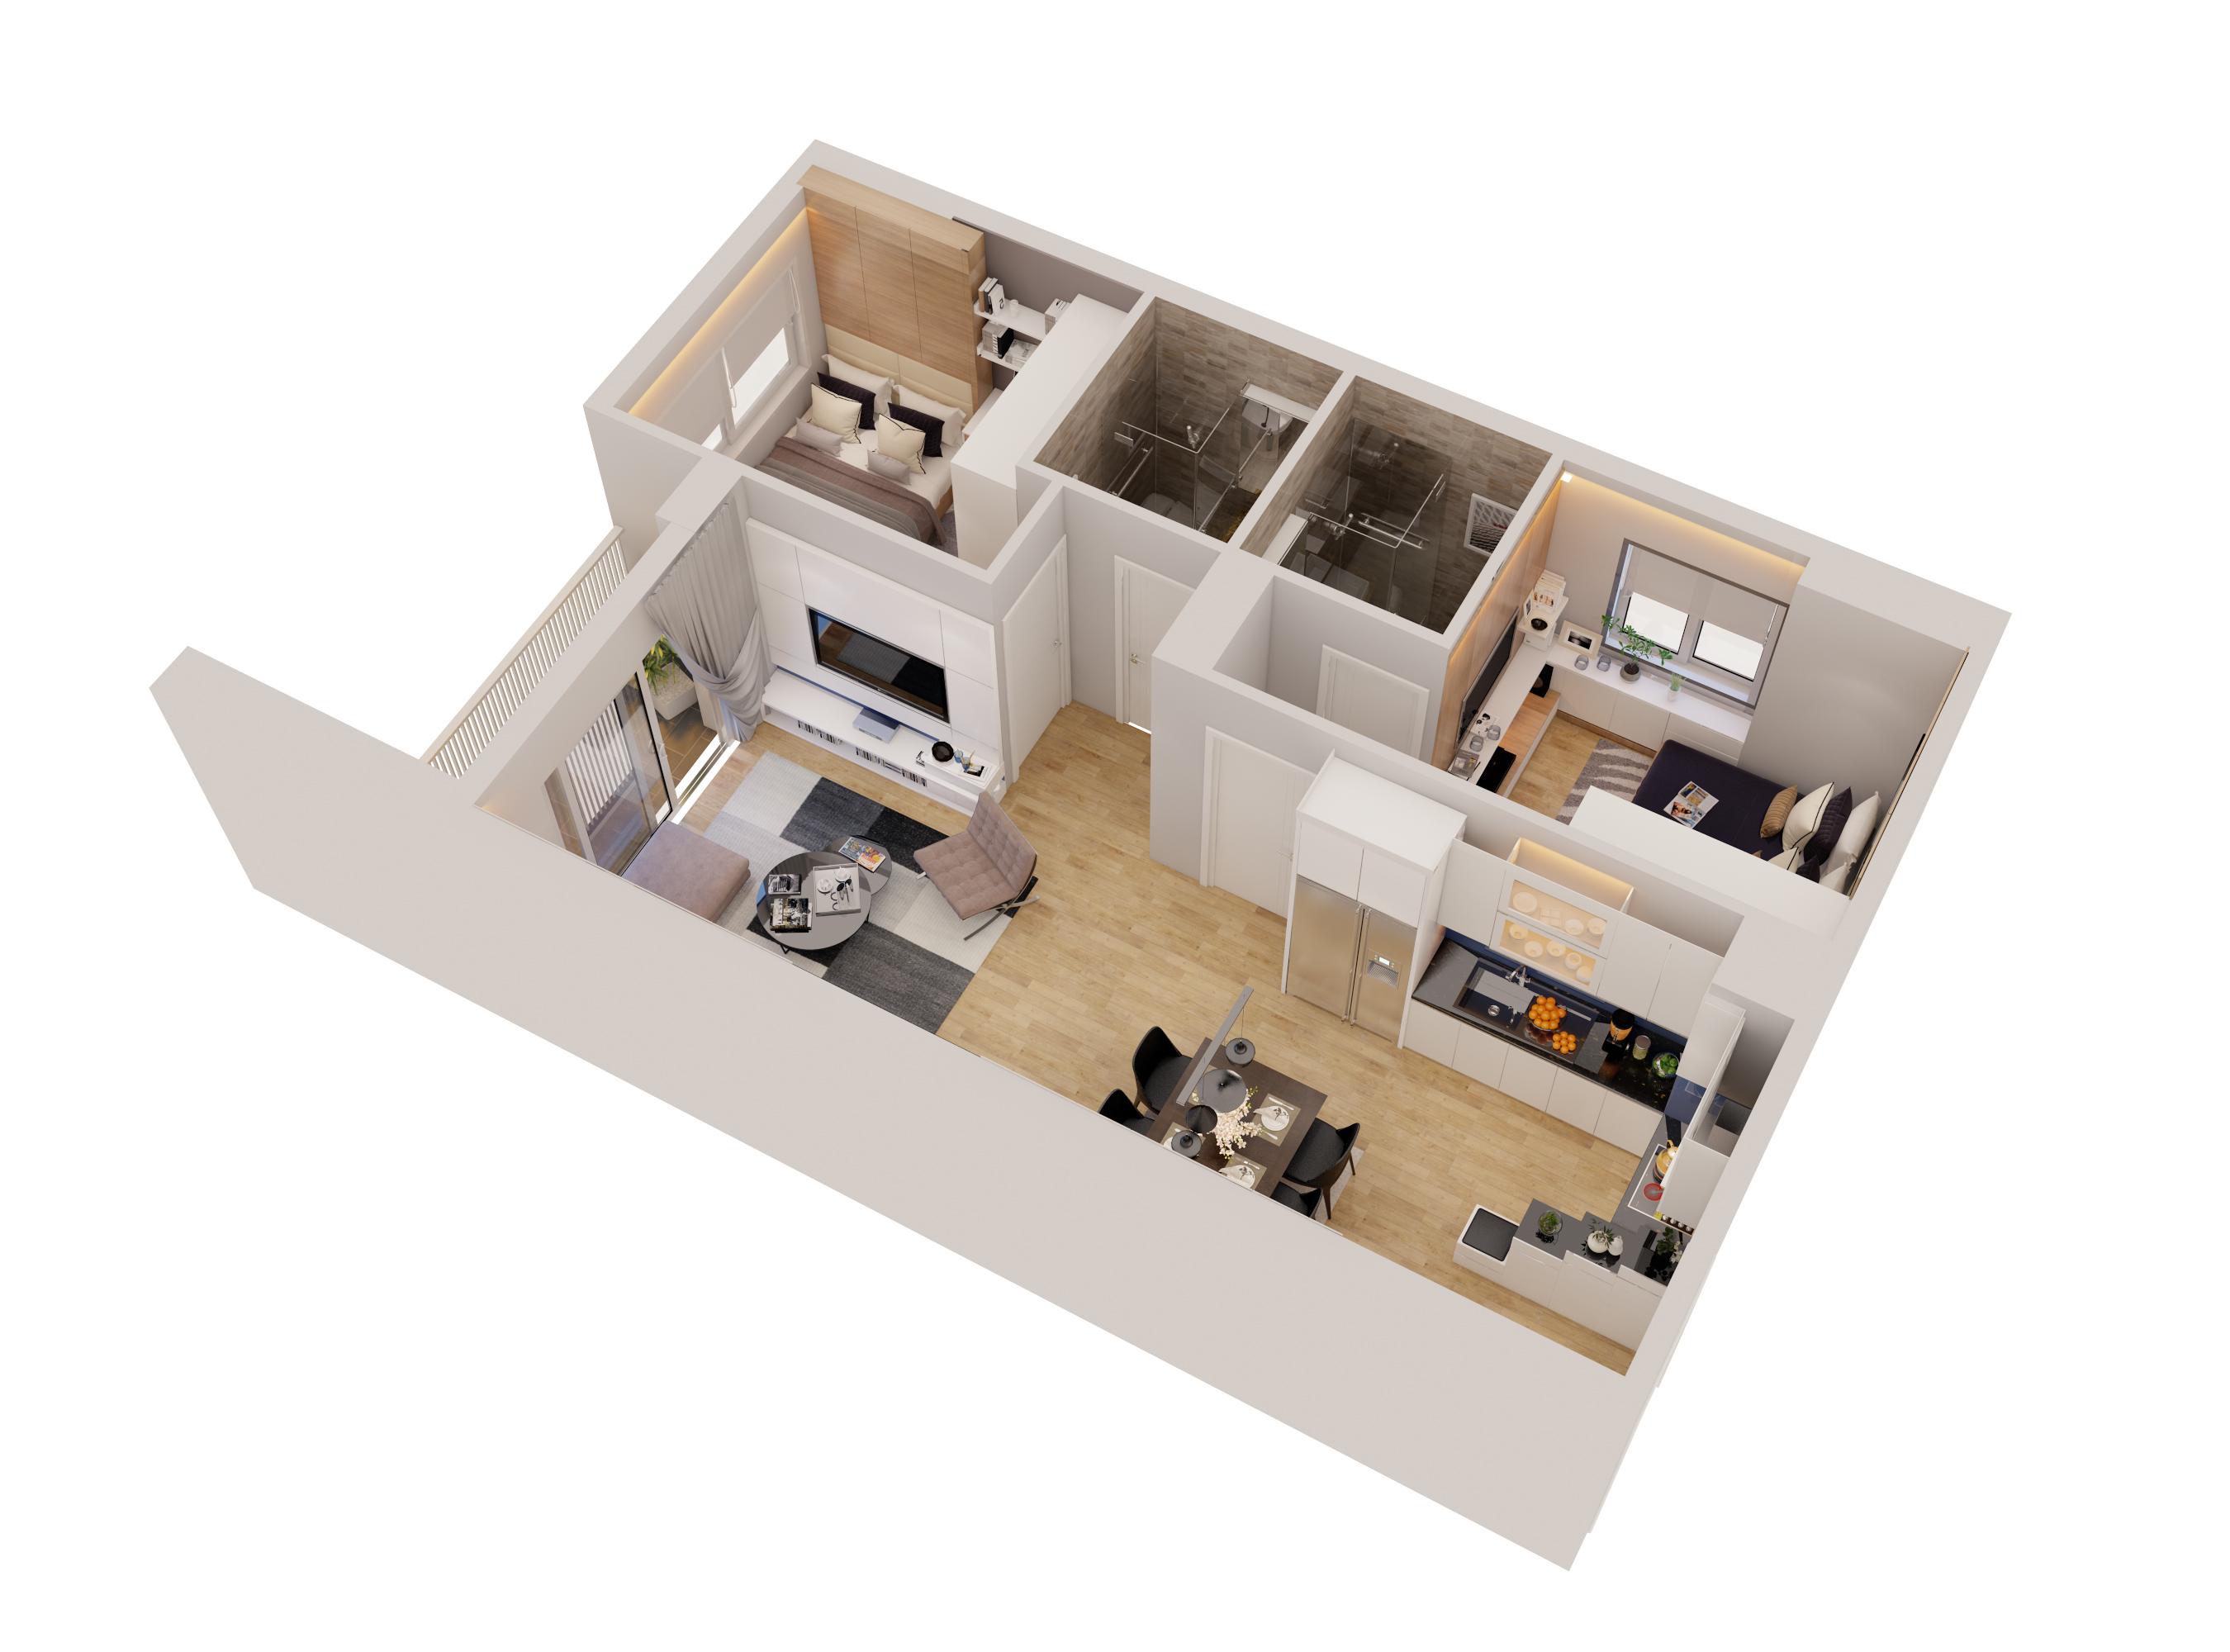 Cutaway apartment full furnitures modern design 3d model max 279955